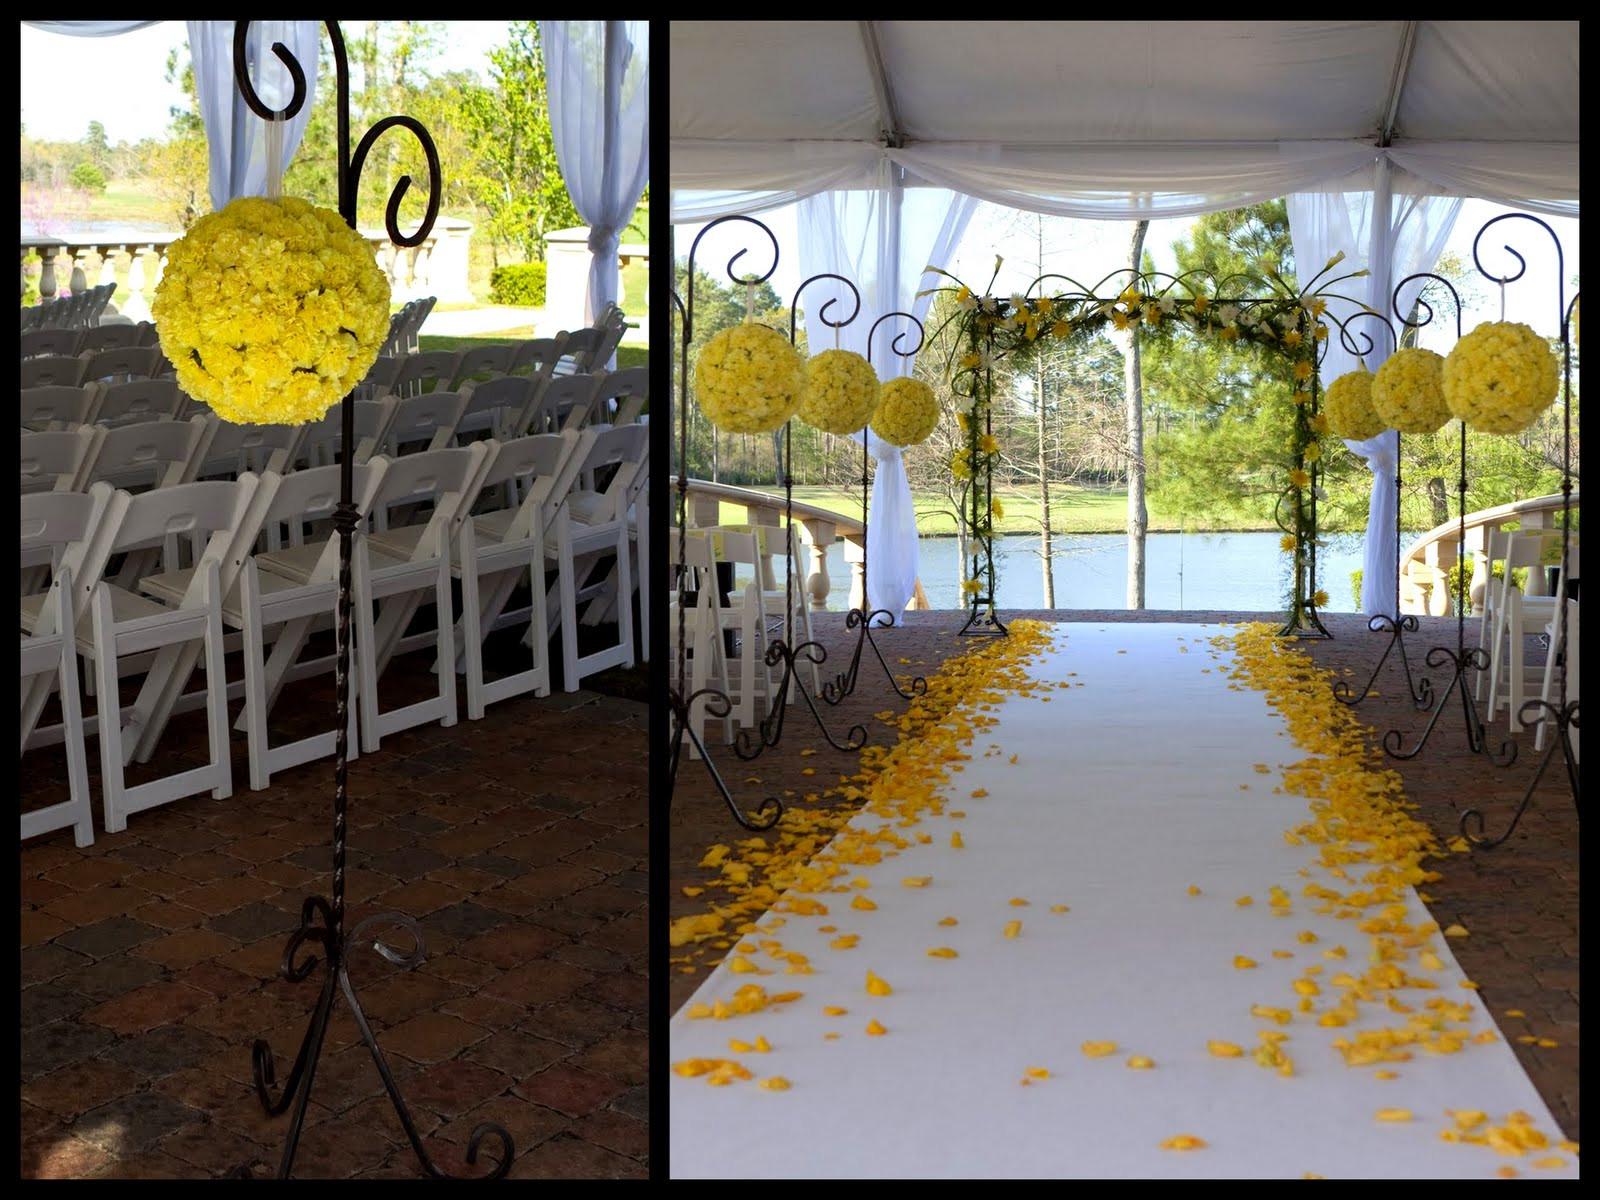 DIY Church Wedding Decorations  Emelin s blog church wedding decor